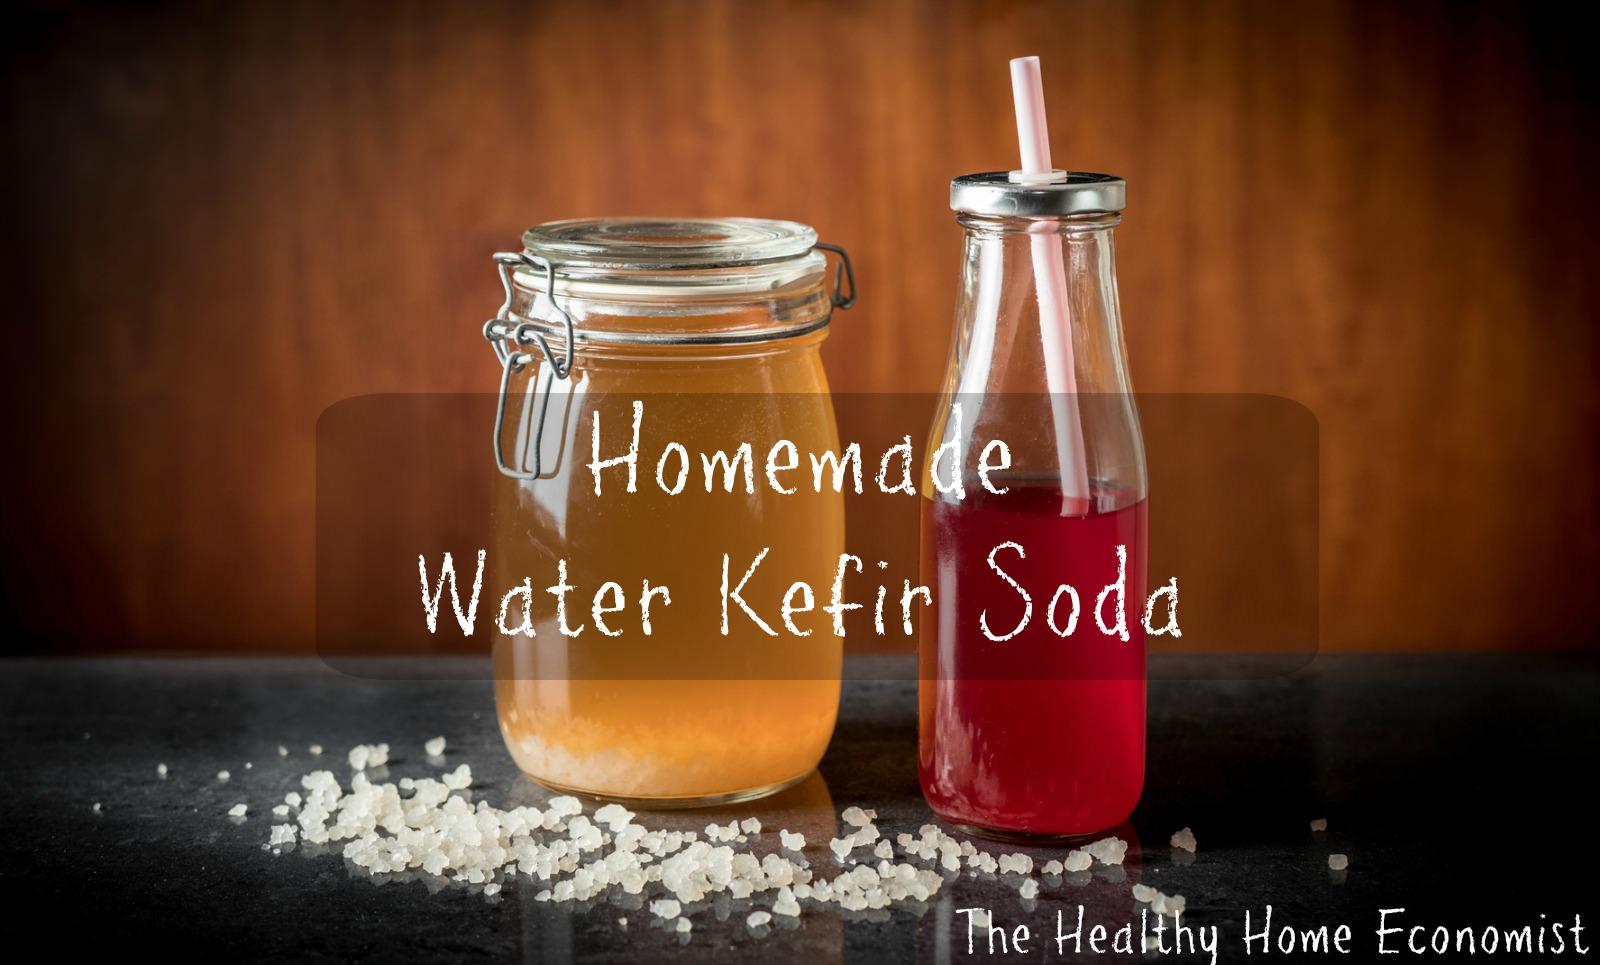 water kefir soda